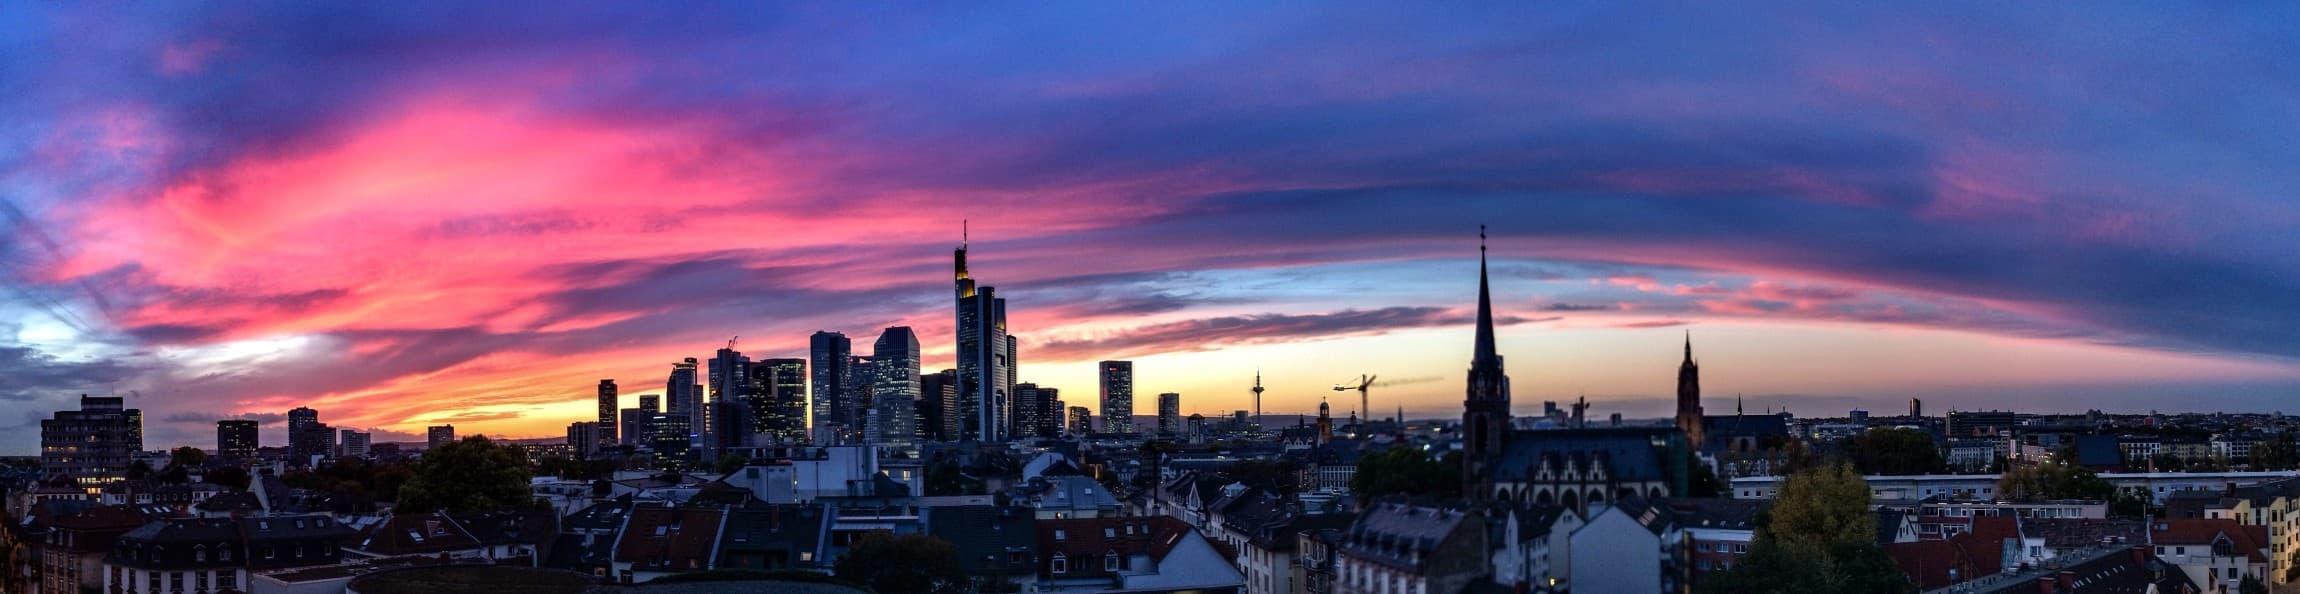 Musikrecht Anwalt Kanzlei Wesaveyourcopyrights Frankfurt Rhein-Main Skyline Frankfurt